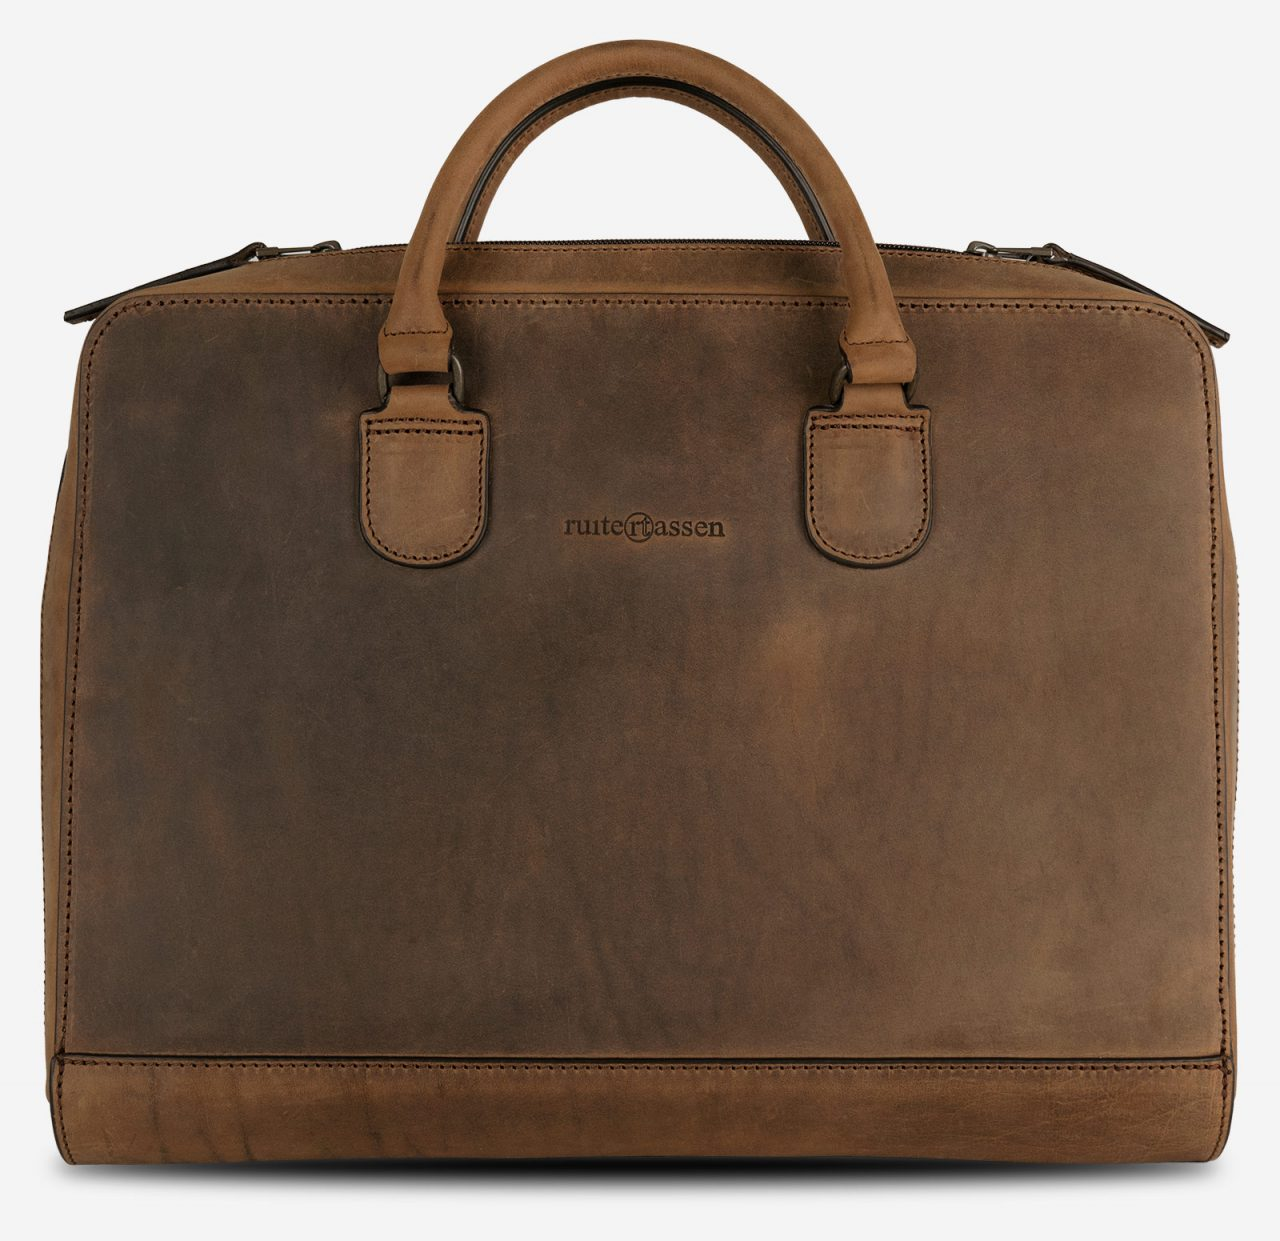 Slim vintage leather briefcase for macbook laptop.